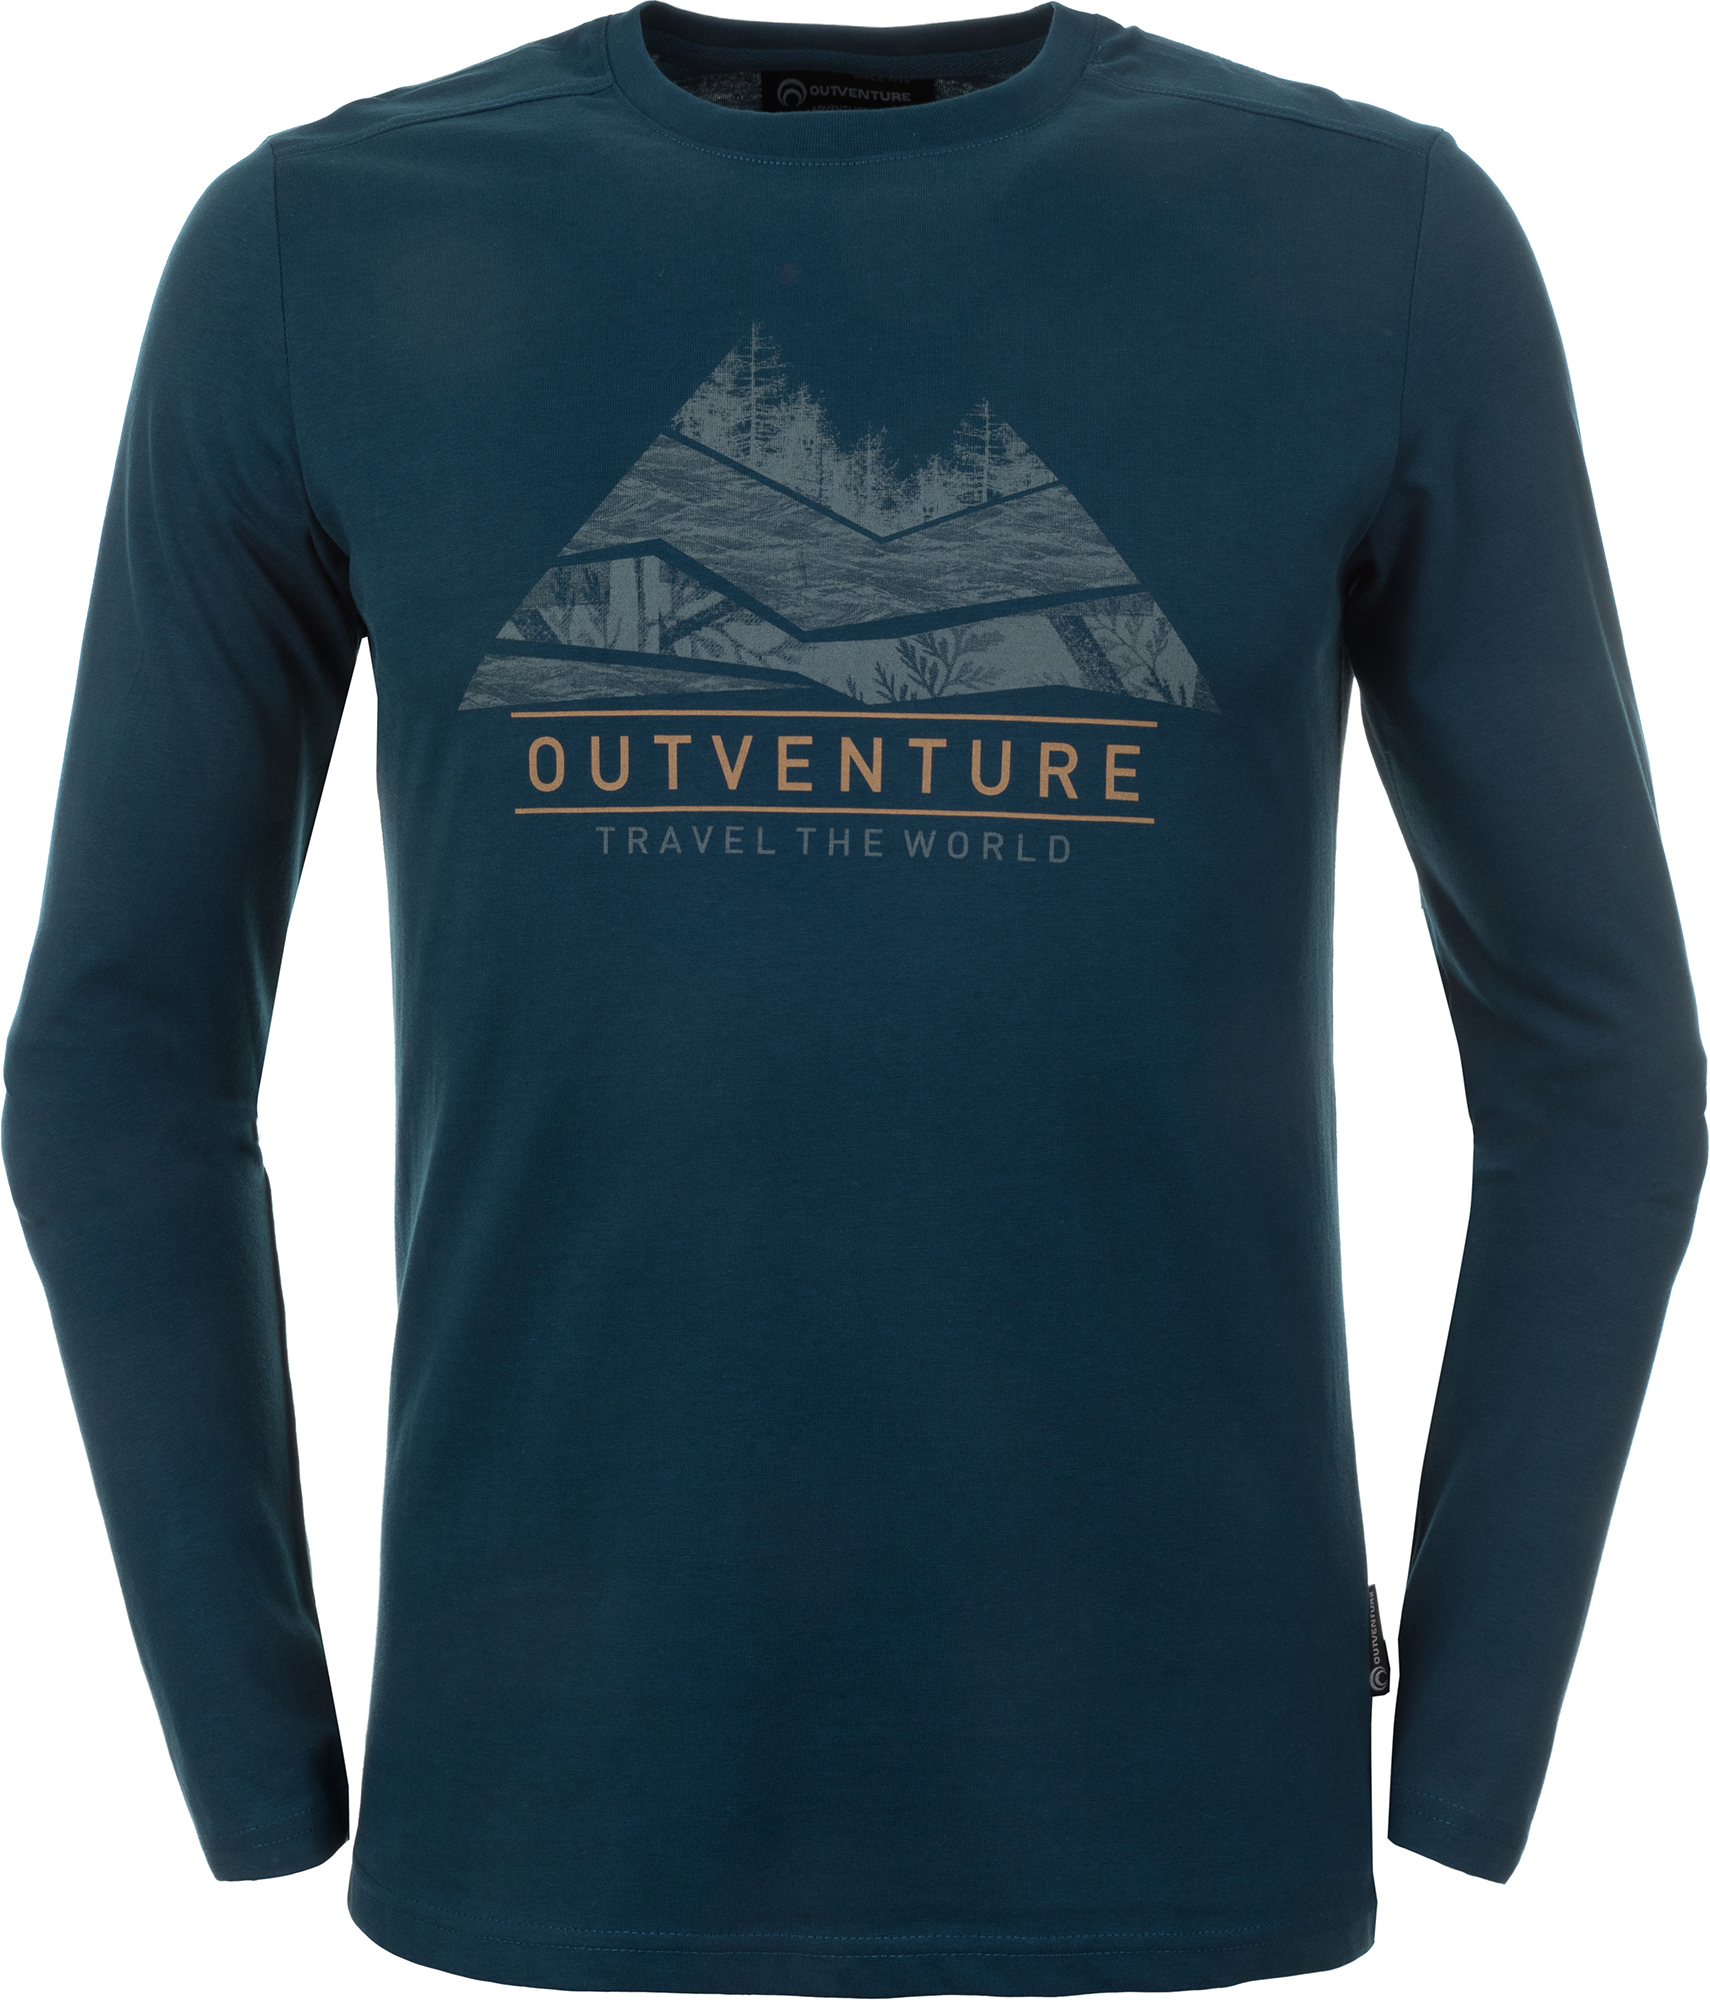 Outventure Футболка с длинным рукавом мужская Outventure, размер 56